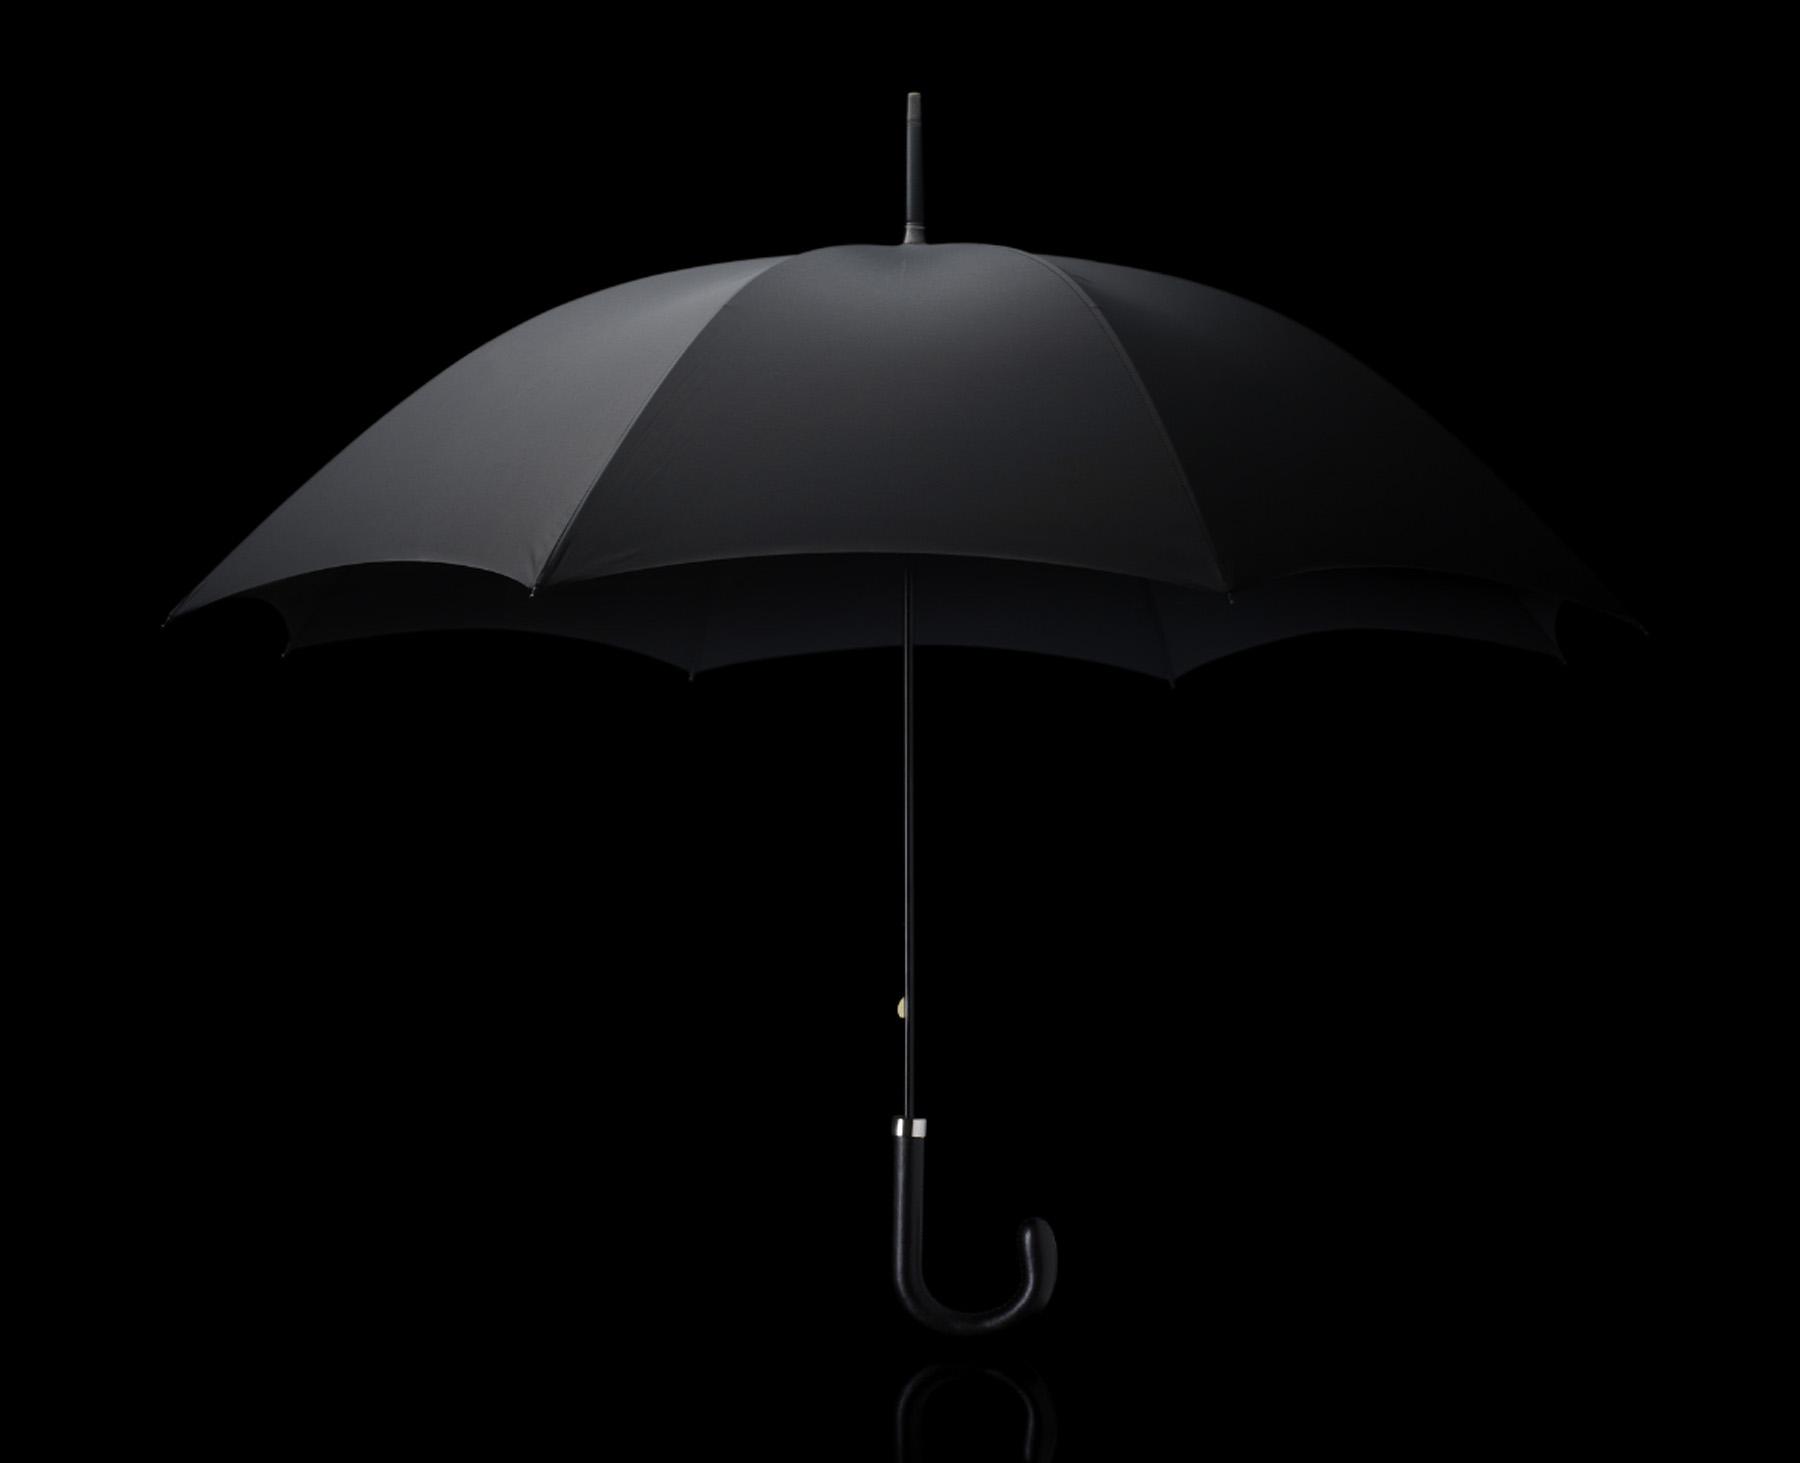 64- icon-artist-management-katie-hammond-advertising-dunhill-umbrella.jpg